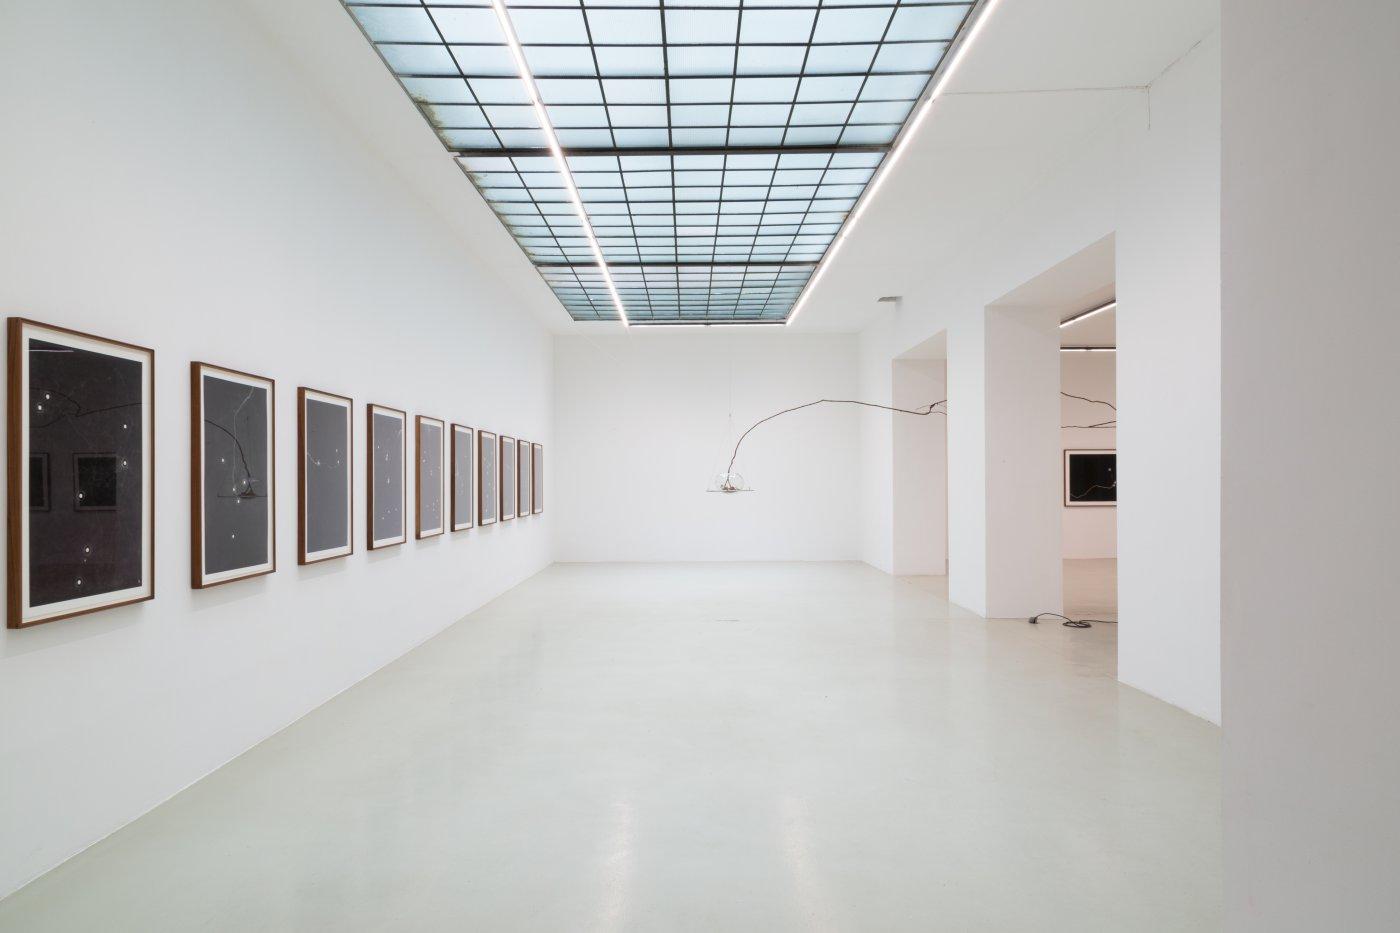 Galerie Kandlhofer Maximilian Prufer 4